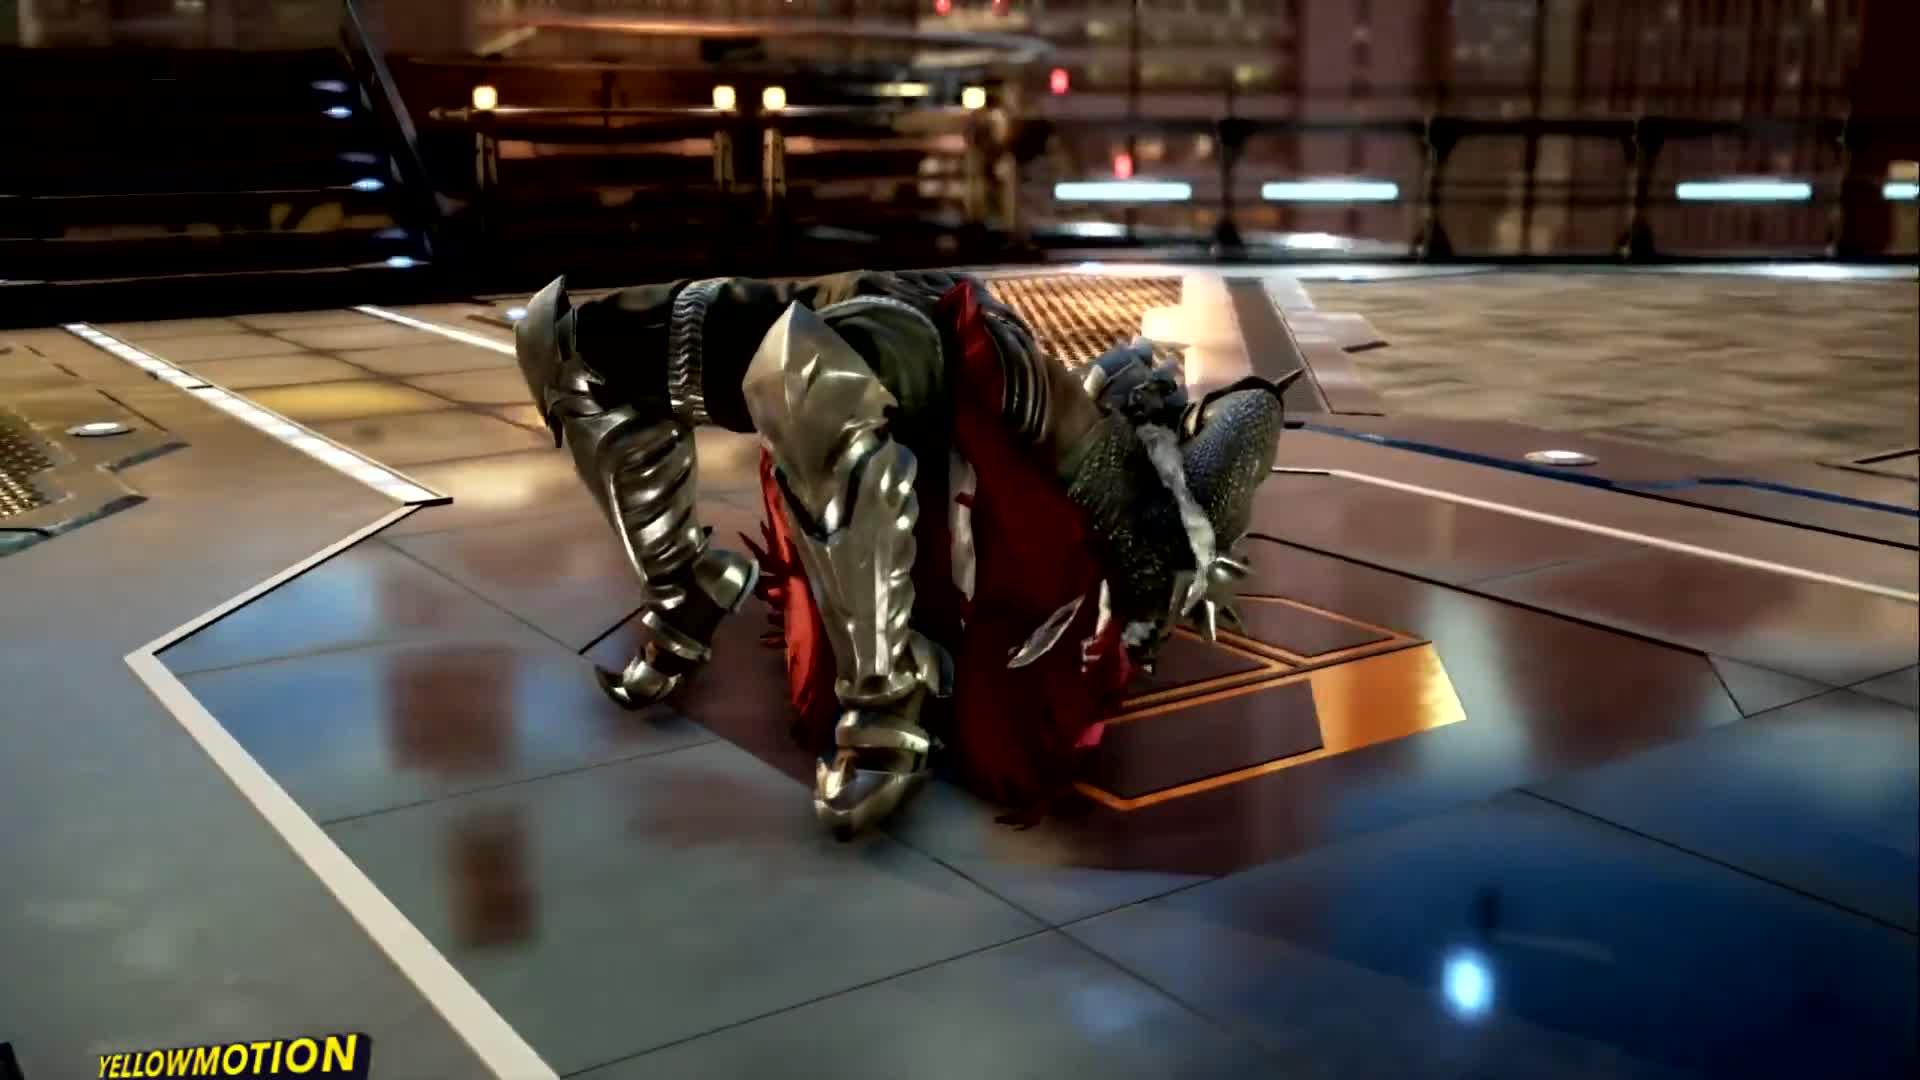 Tekken 7 Season 2 Gifs Search   Search & Share on Homdor